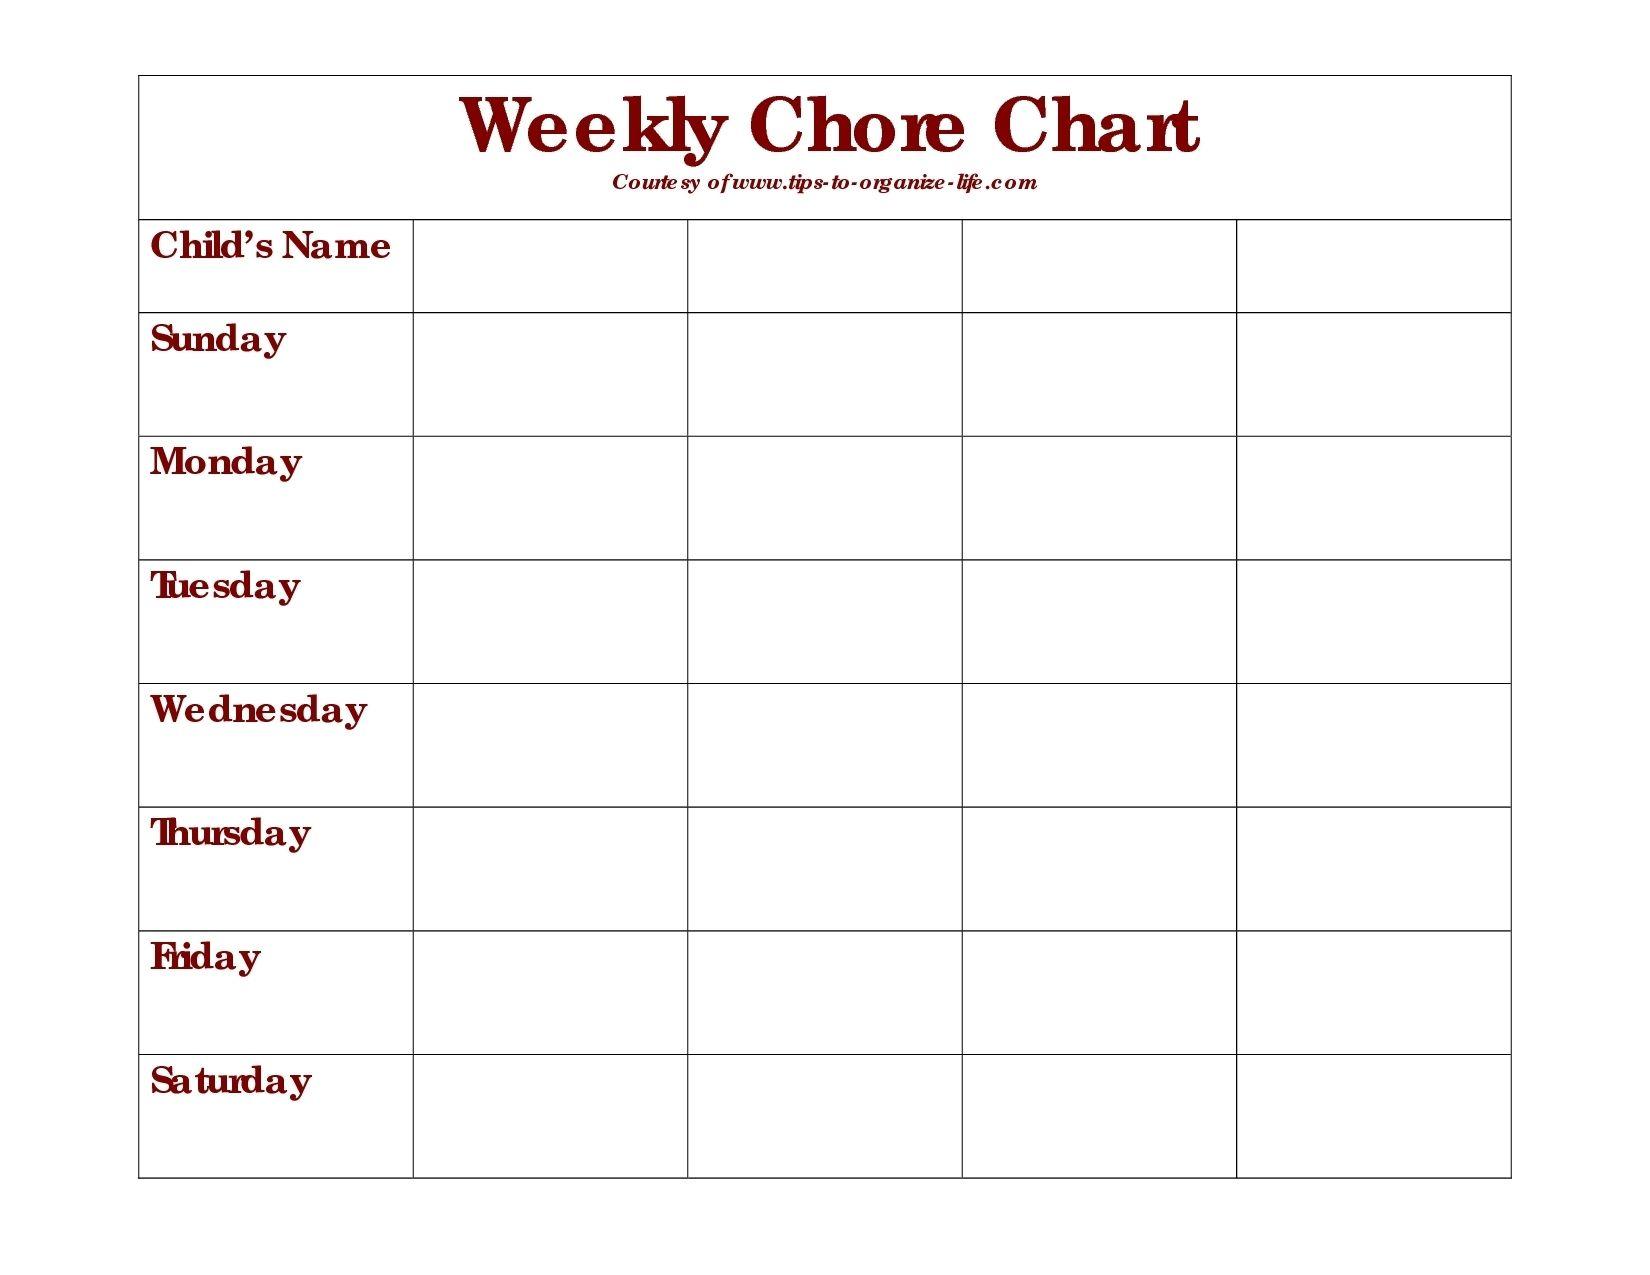 picture regarding Printable Blank Chore Chart titled Everyday Chore Chart Printable - Ibov.jonathandedecker inside